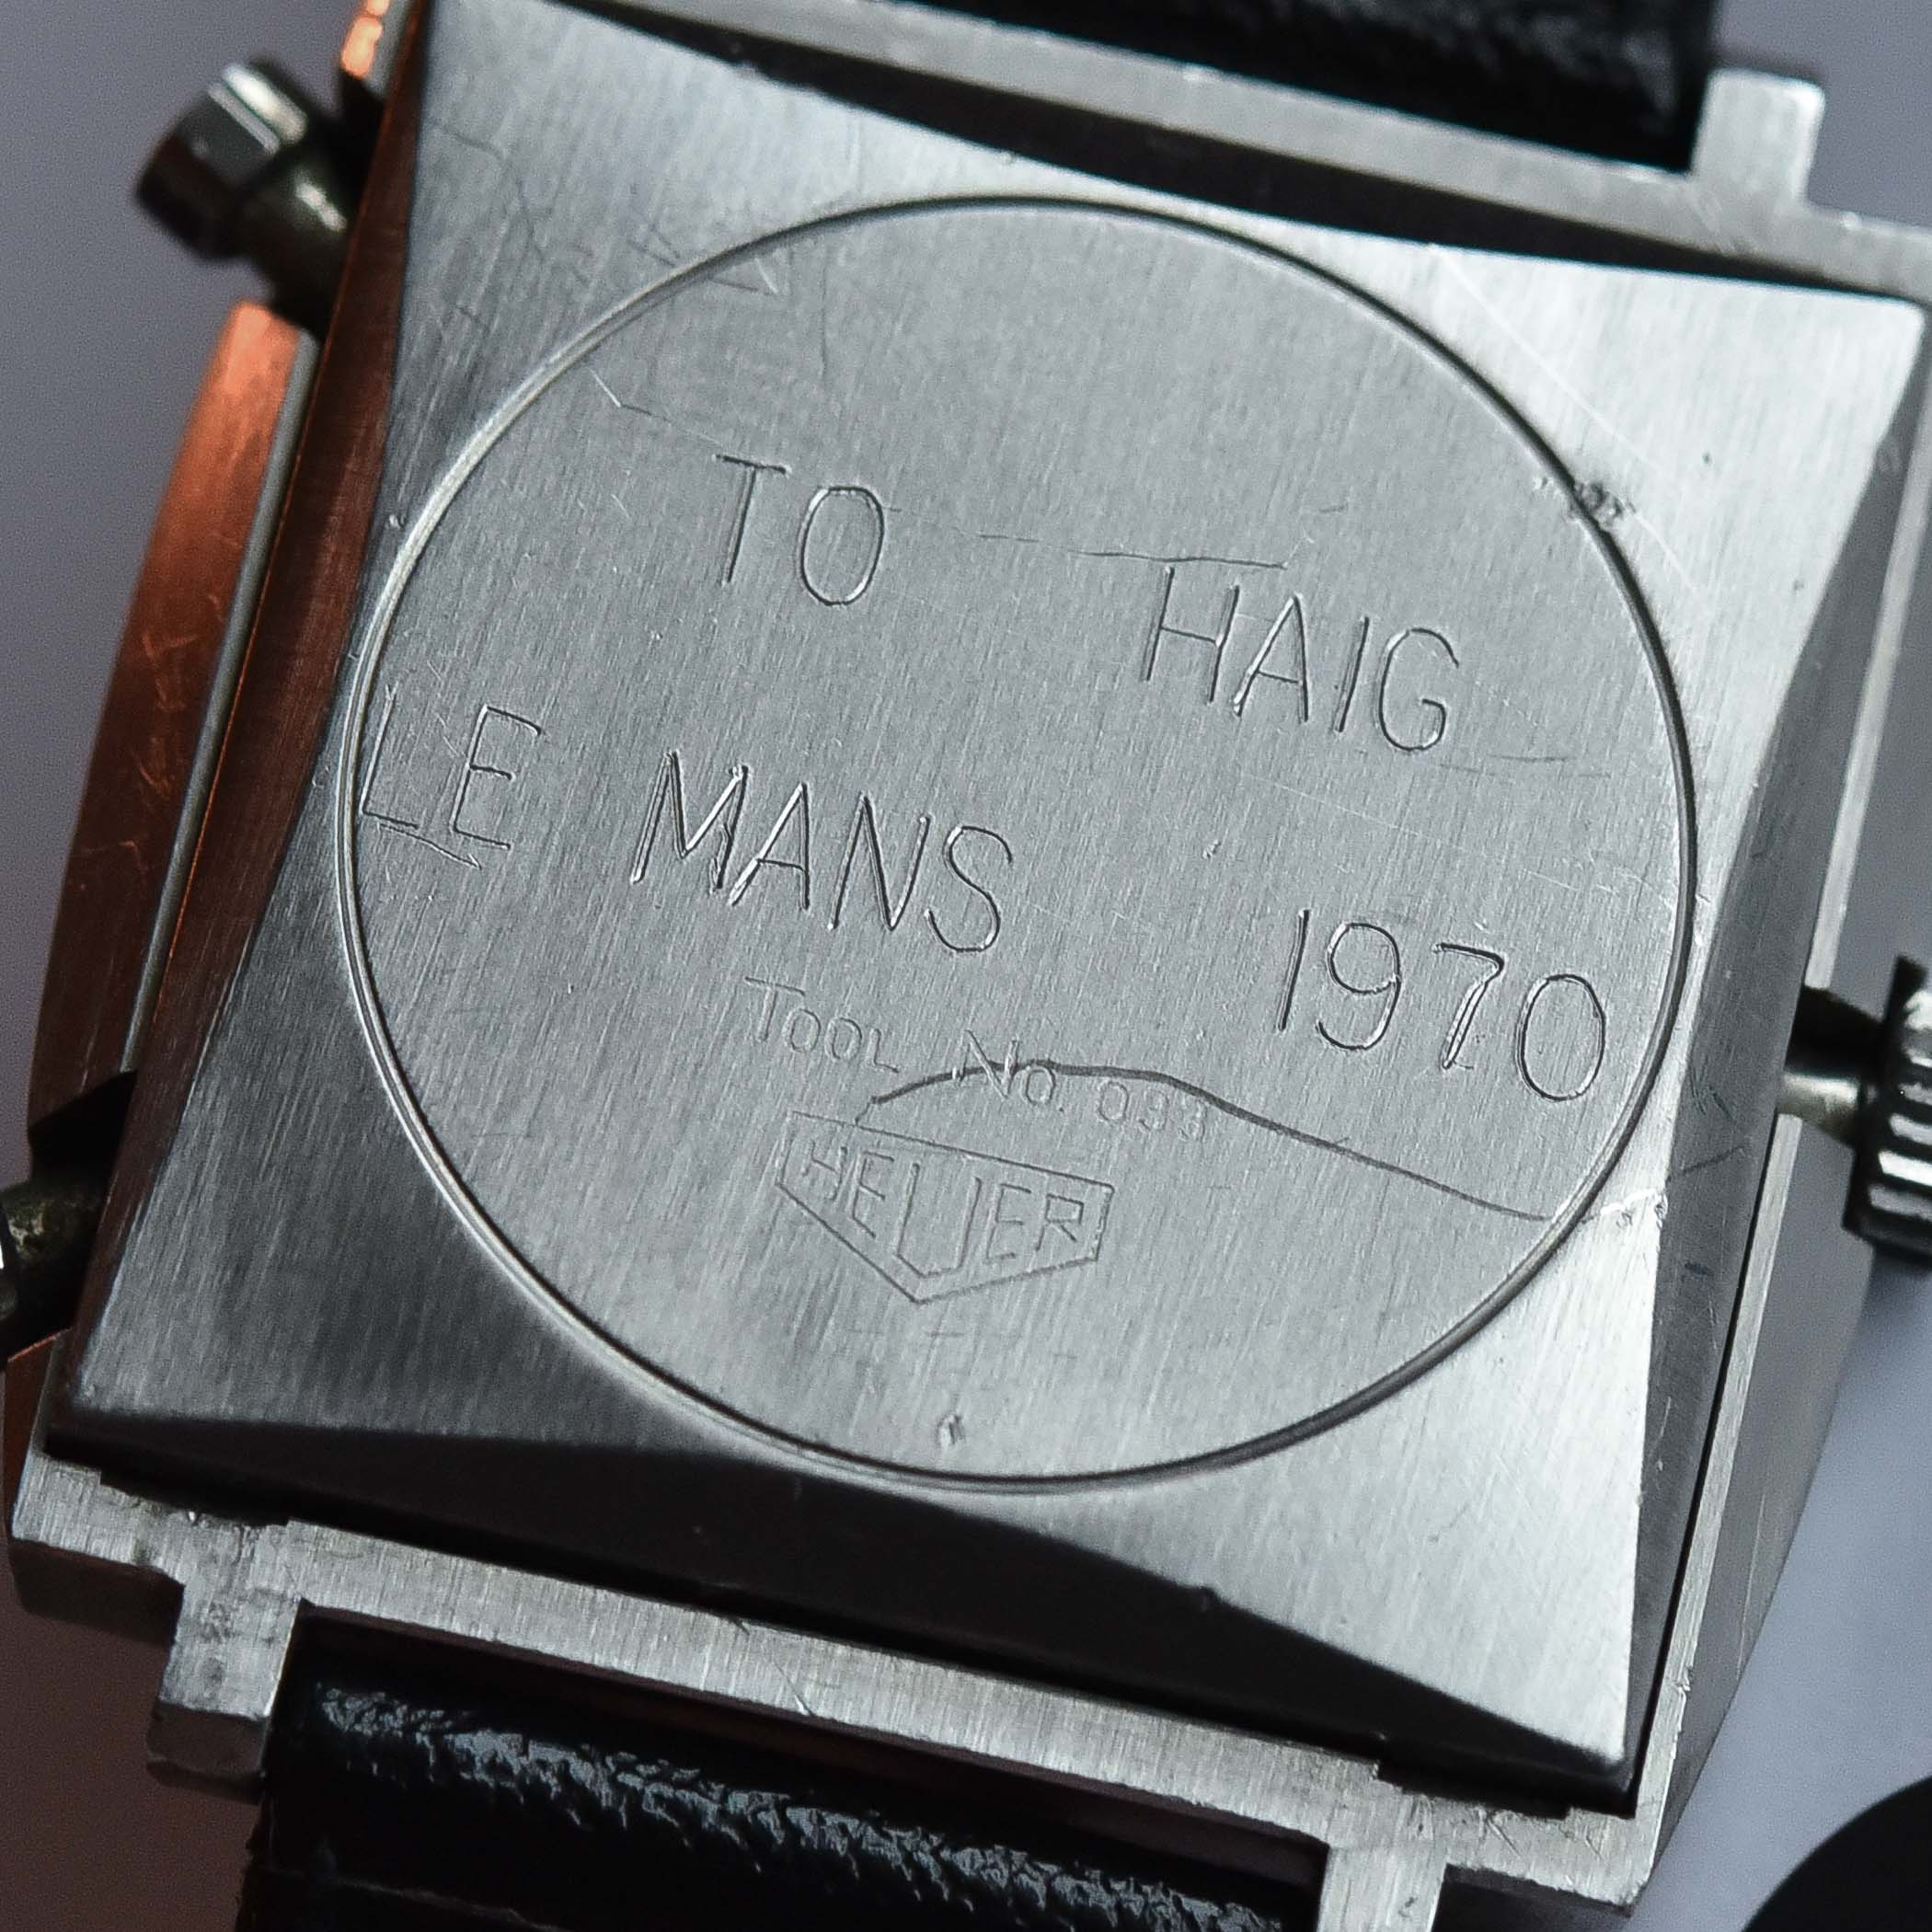 Heuer Monaco 1133B Steve McQueen worn Le Mans Haig Alltounian